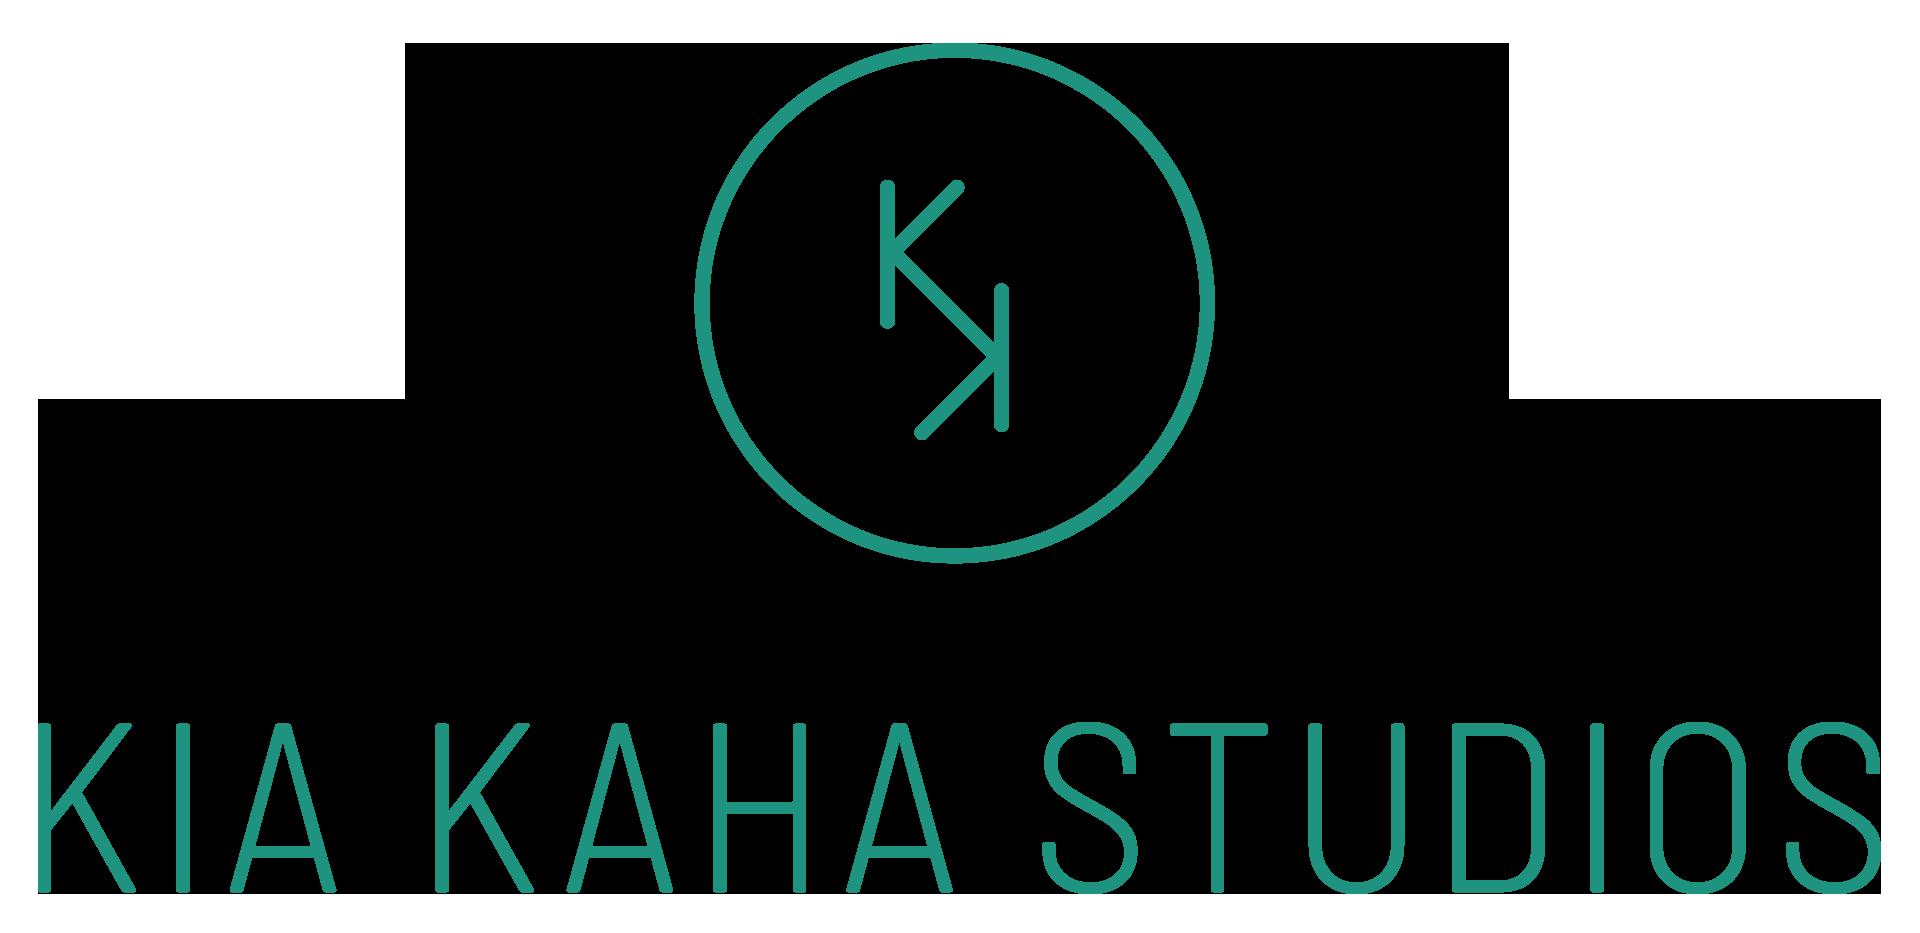 Kia Kaha Studios